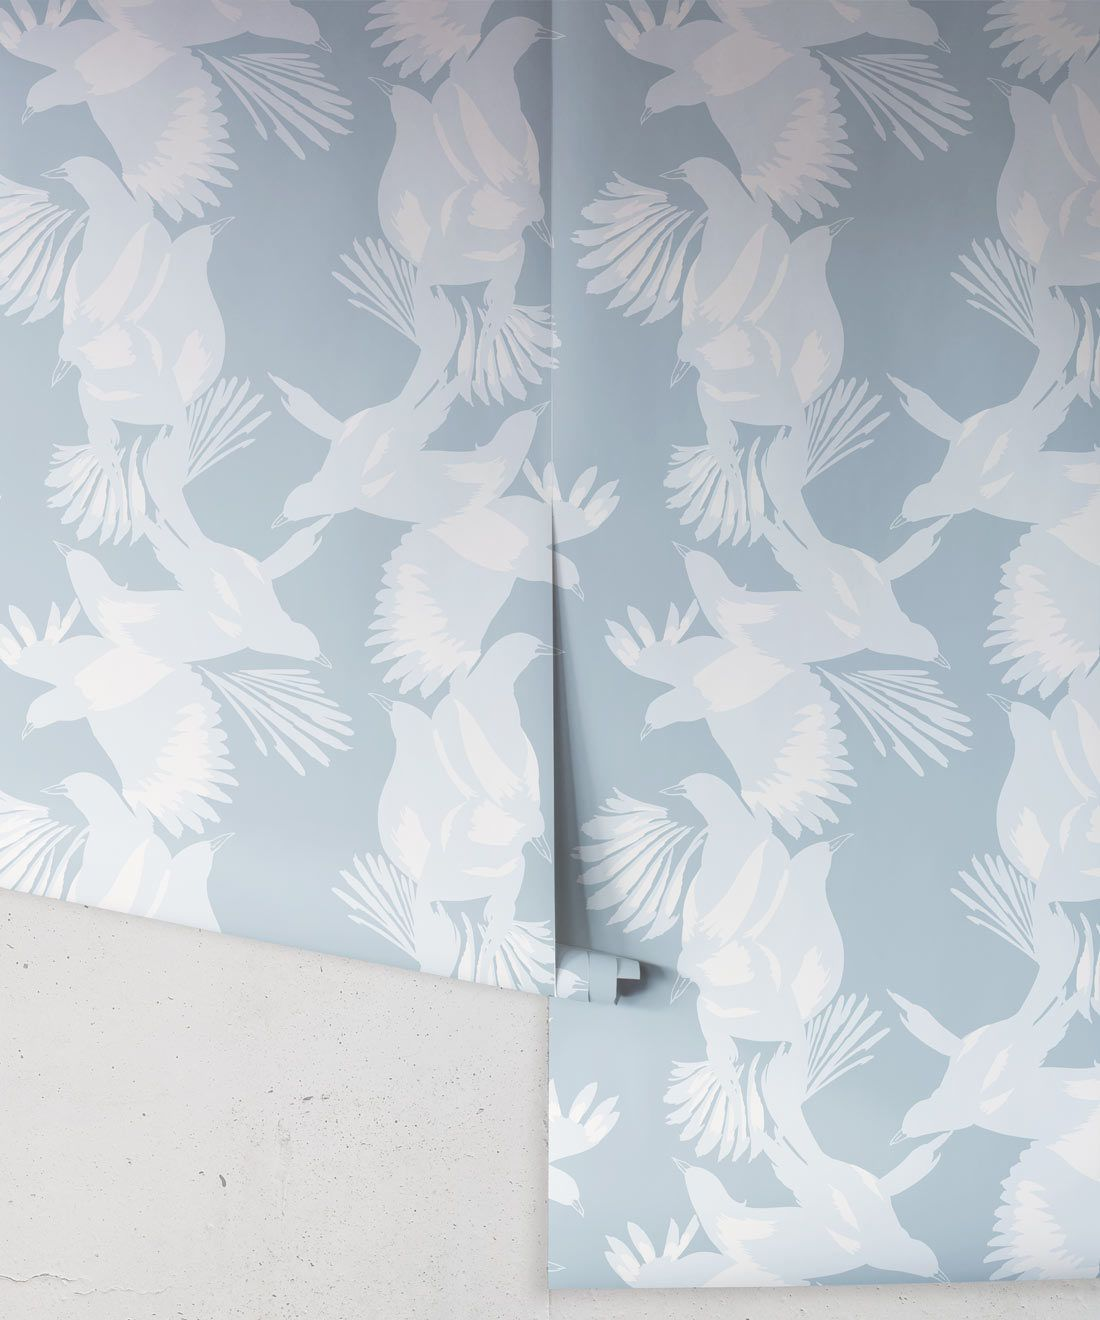 Magpie Wallpaper • Milton & King • Kingdom Home • Bird Wallpaper • Blue Bell Roll